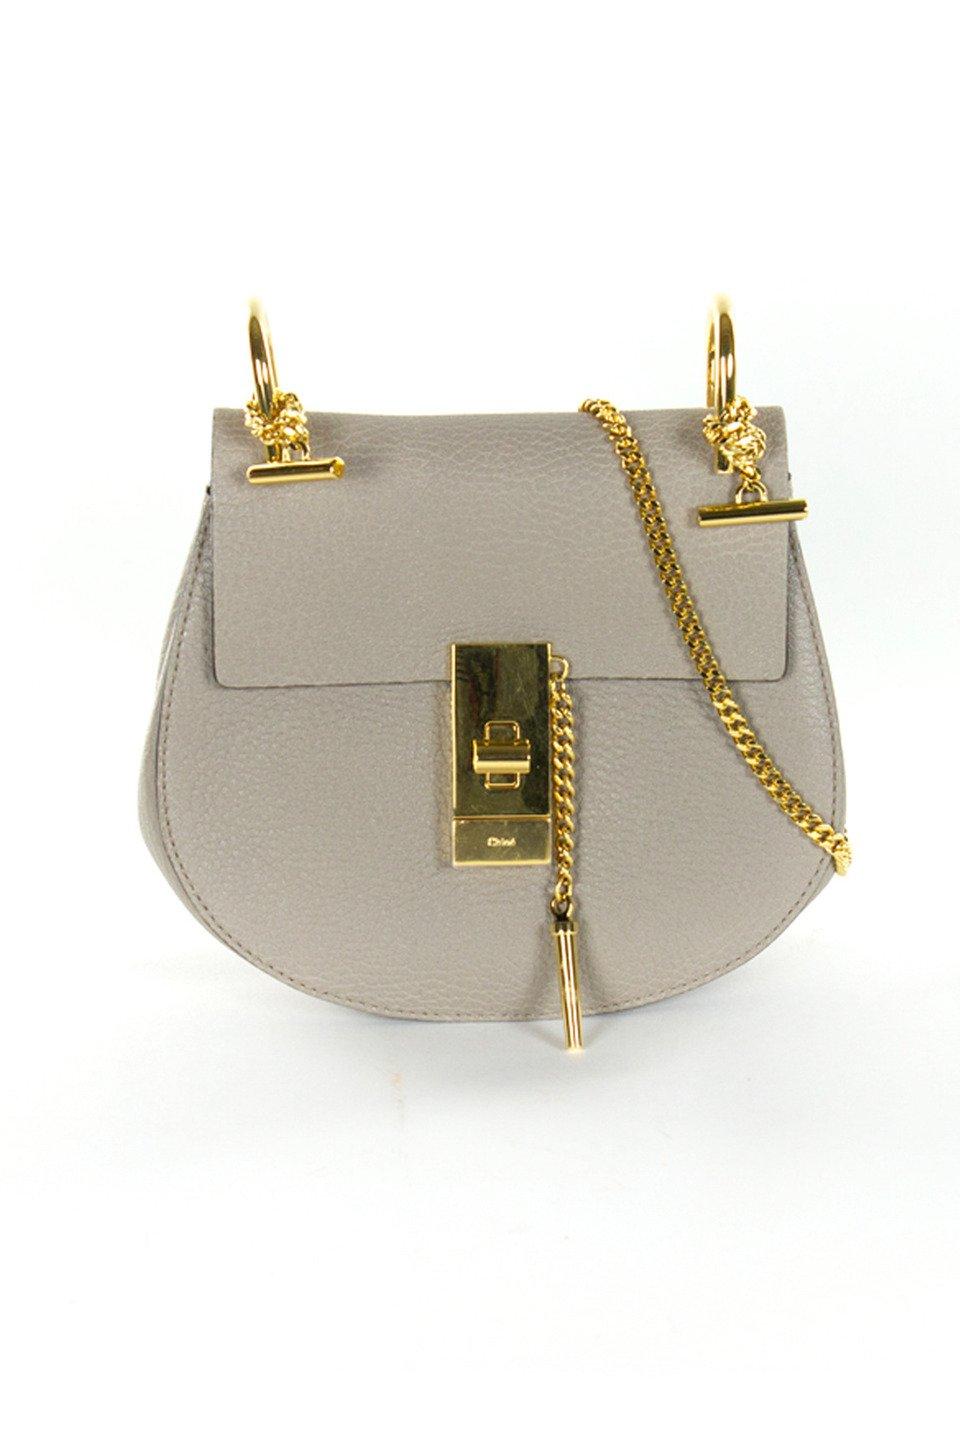 Chloe Leather Handbag in Motty Gray